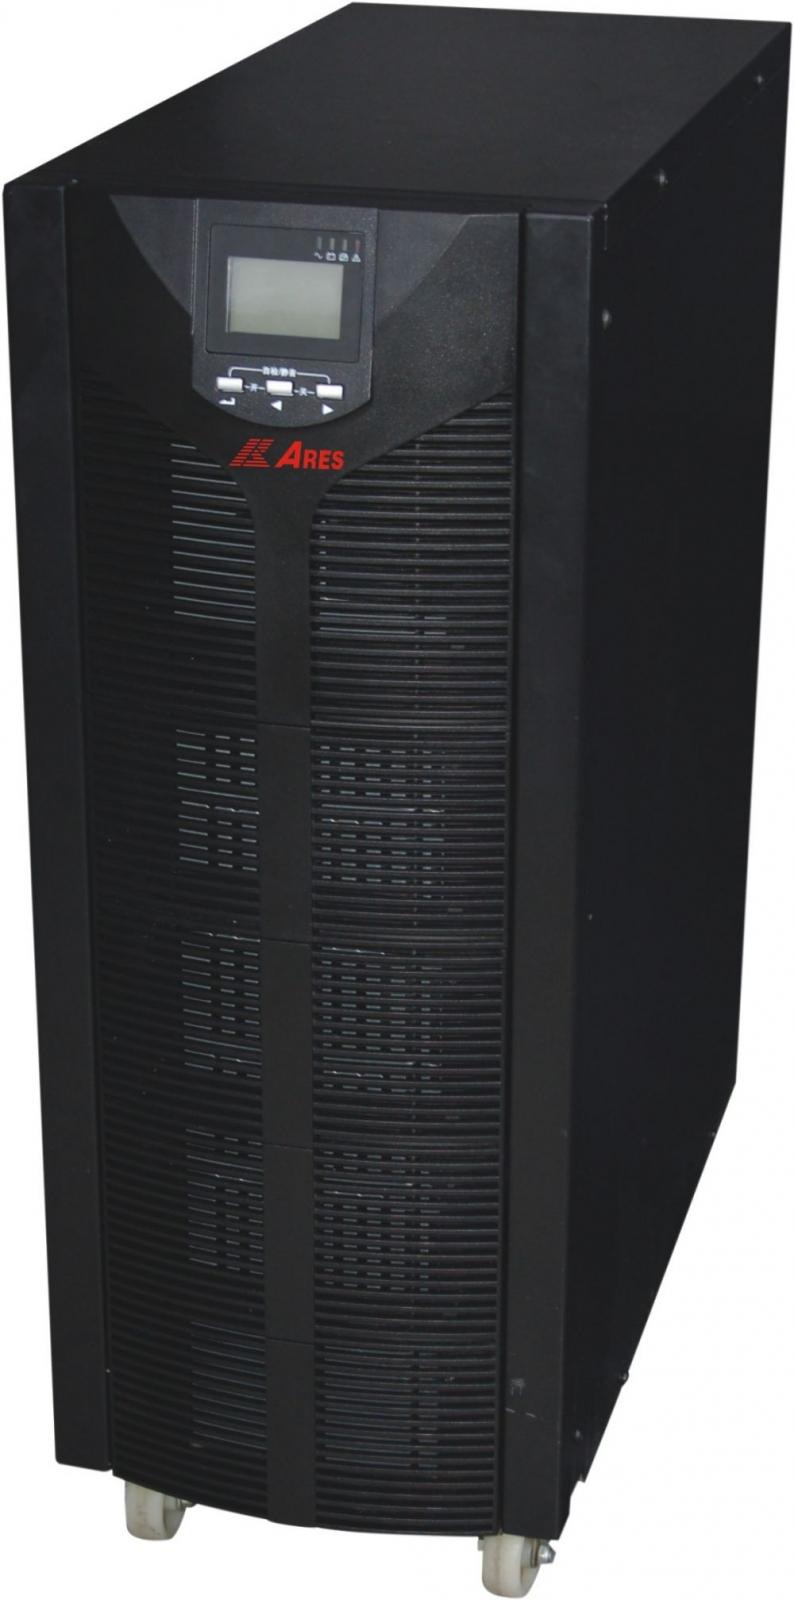 UPS 10KVA Ares AR9010IIH (9kw) Online Tower